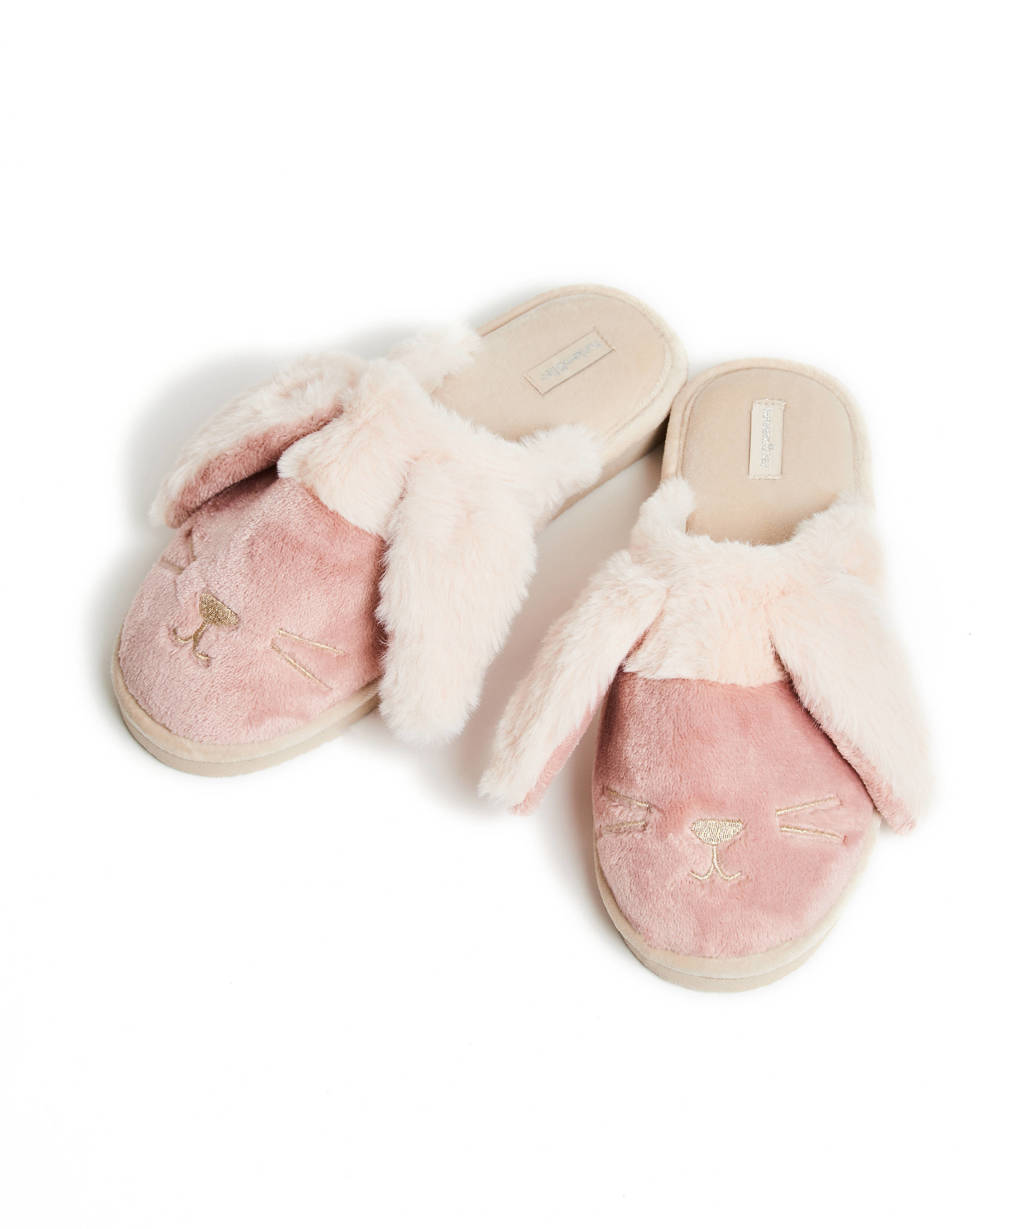 Hunkemöller pantoffels Bunny van imitatiebont roze/ecru, Roze/ecru